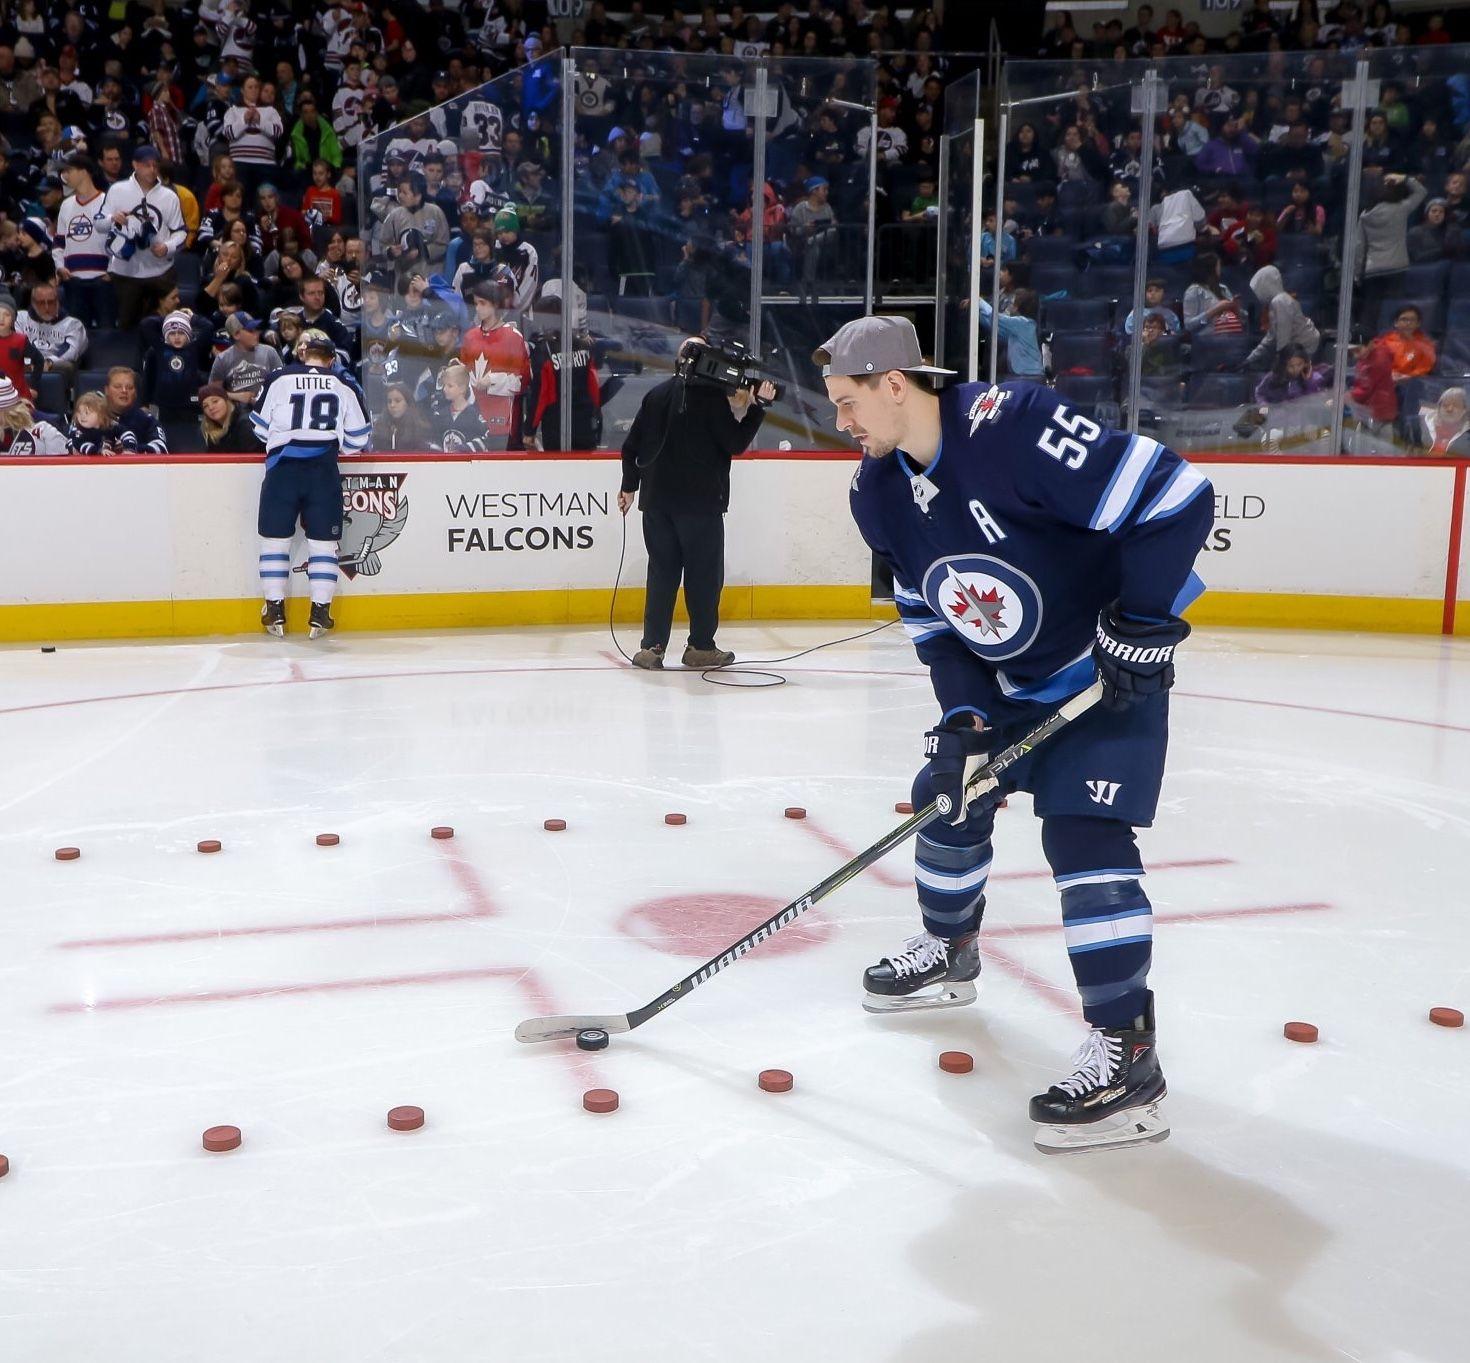 Pin By Stewart Thomson On Puck Jets Hockey Winnipeg Jets Nfl Fans